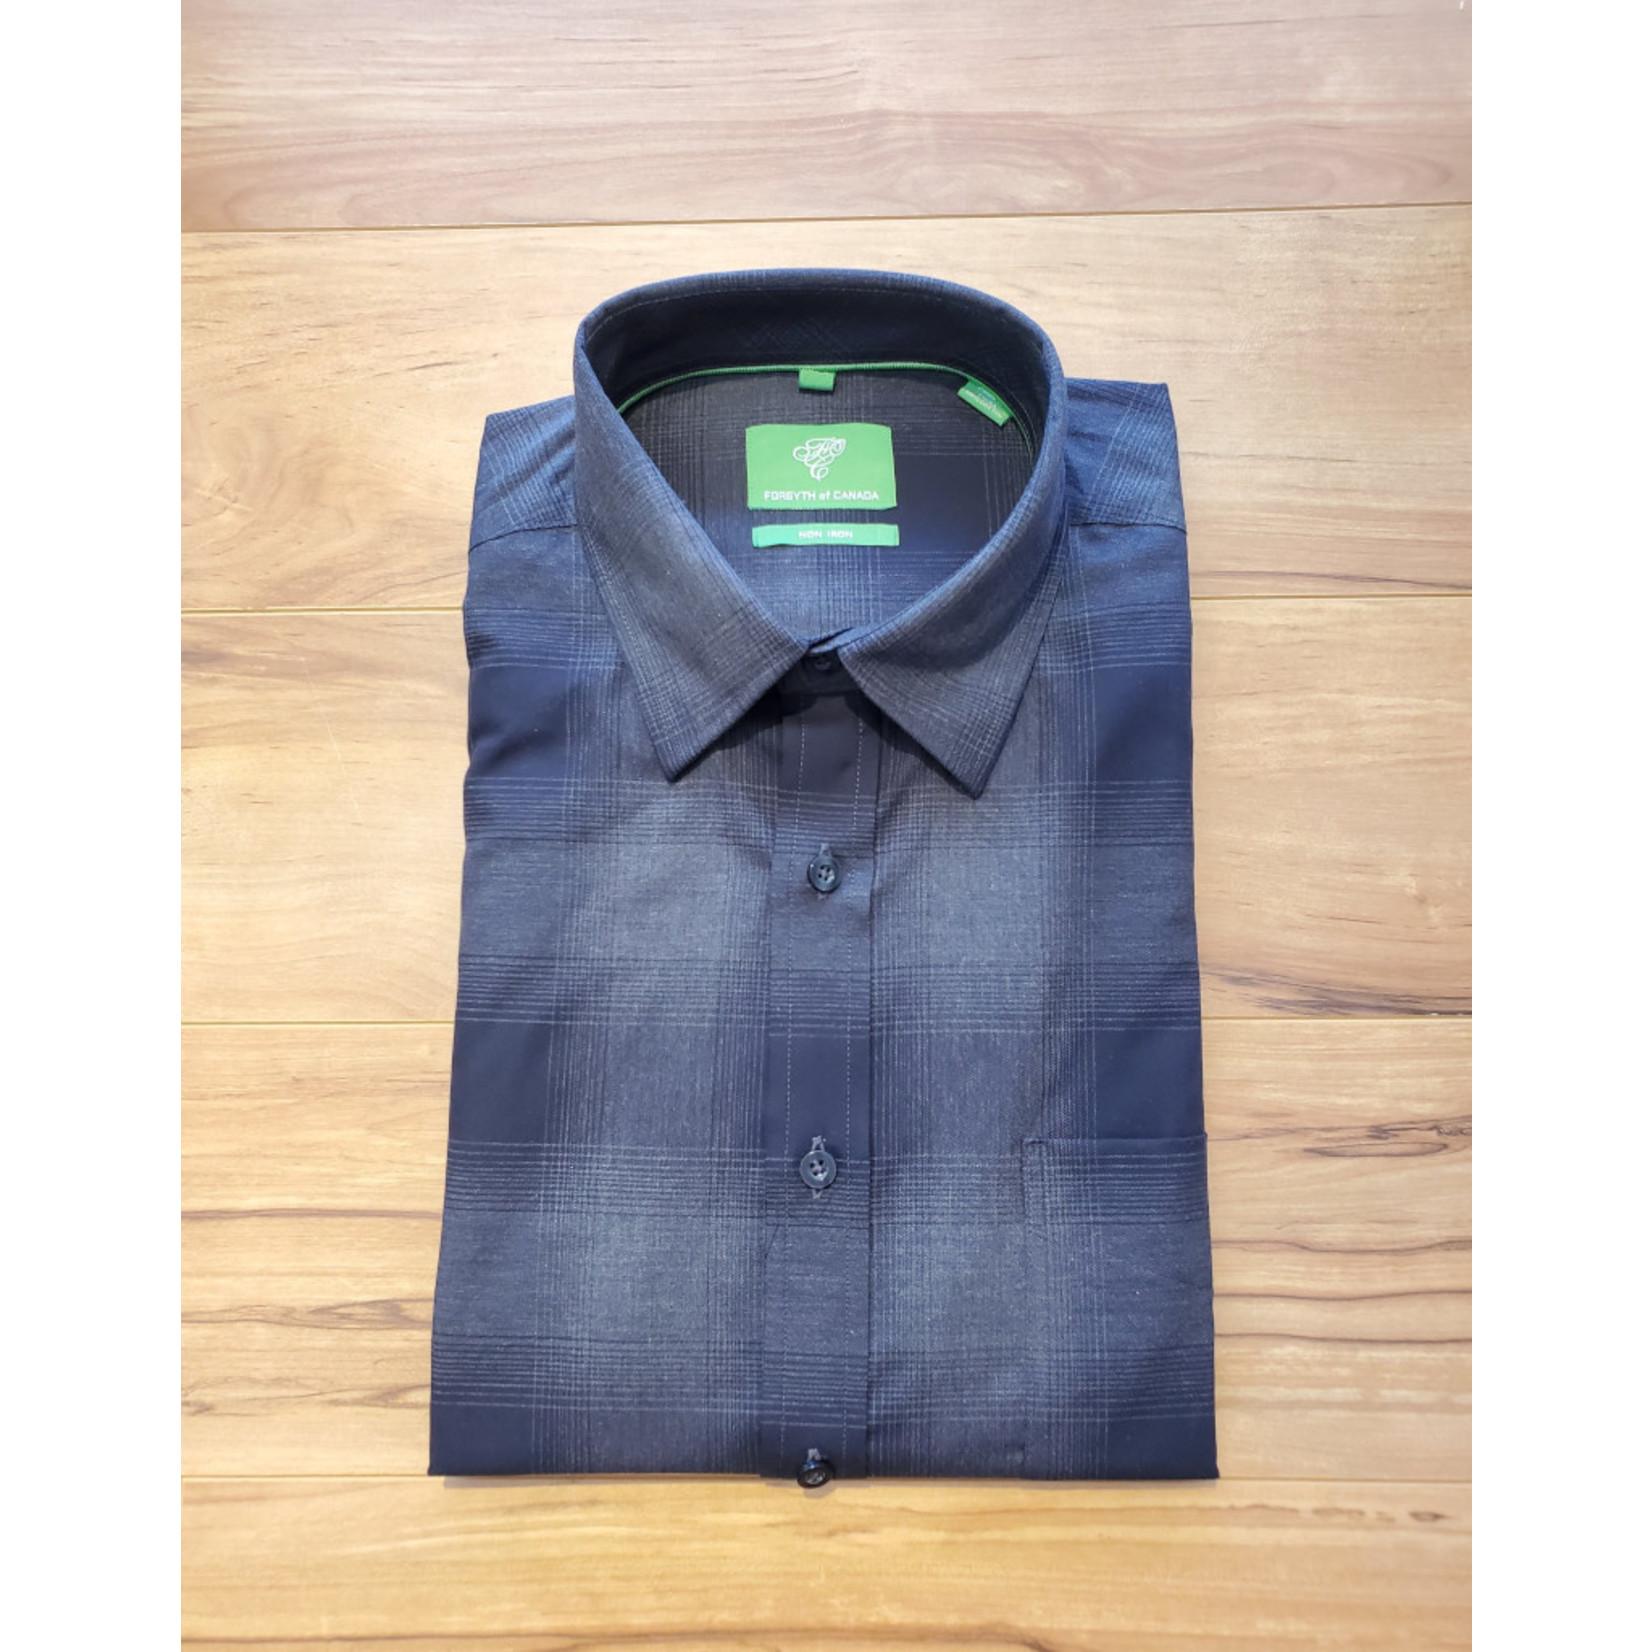 Forsyth Forsyth Long Sleeve Button Down - Heathered Coal Check